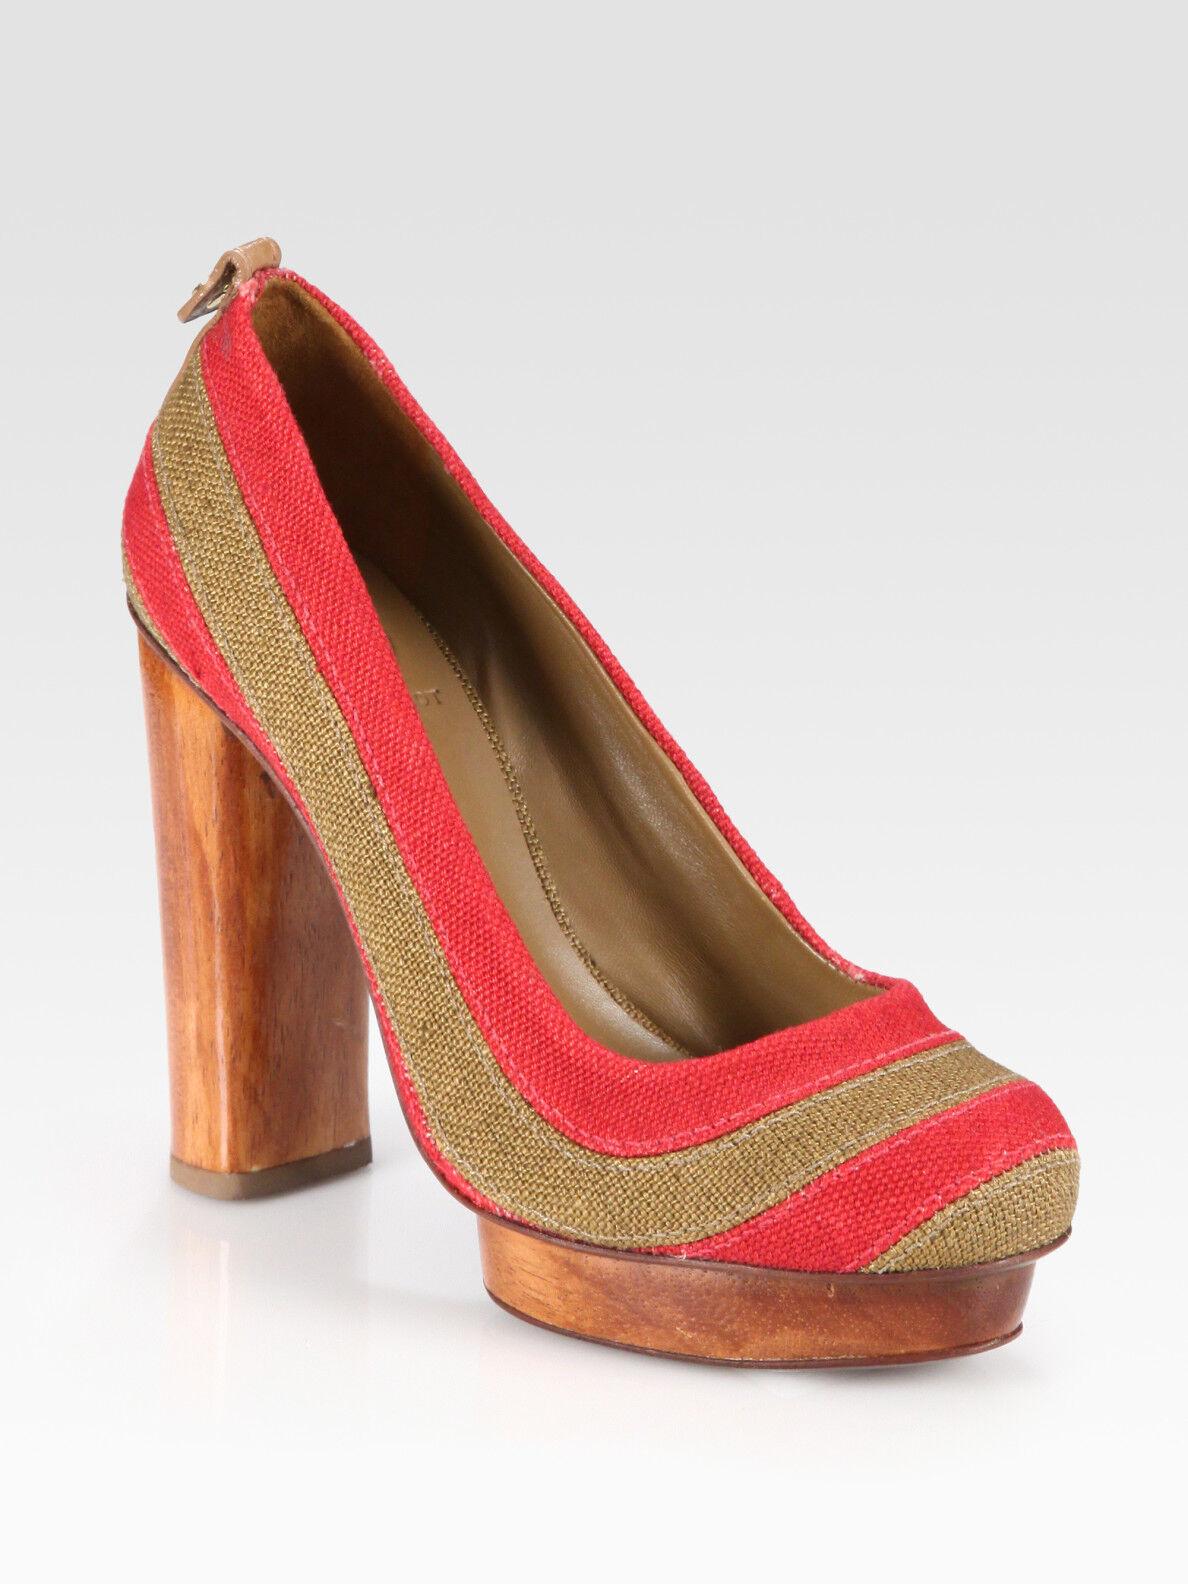 350 Sz.9.5M Tory Burch Joelle  Pumps Canvas Wood Heel Platform Logo shoes